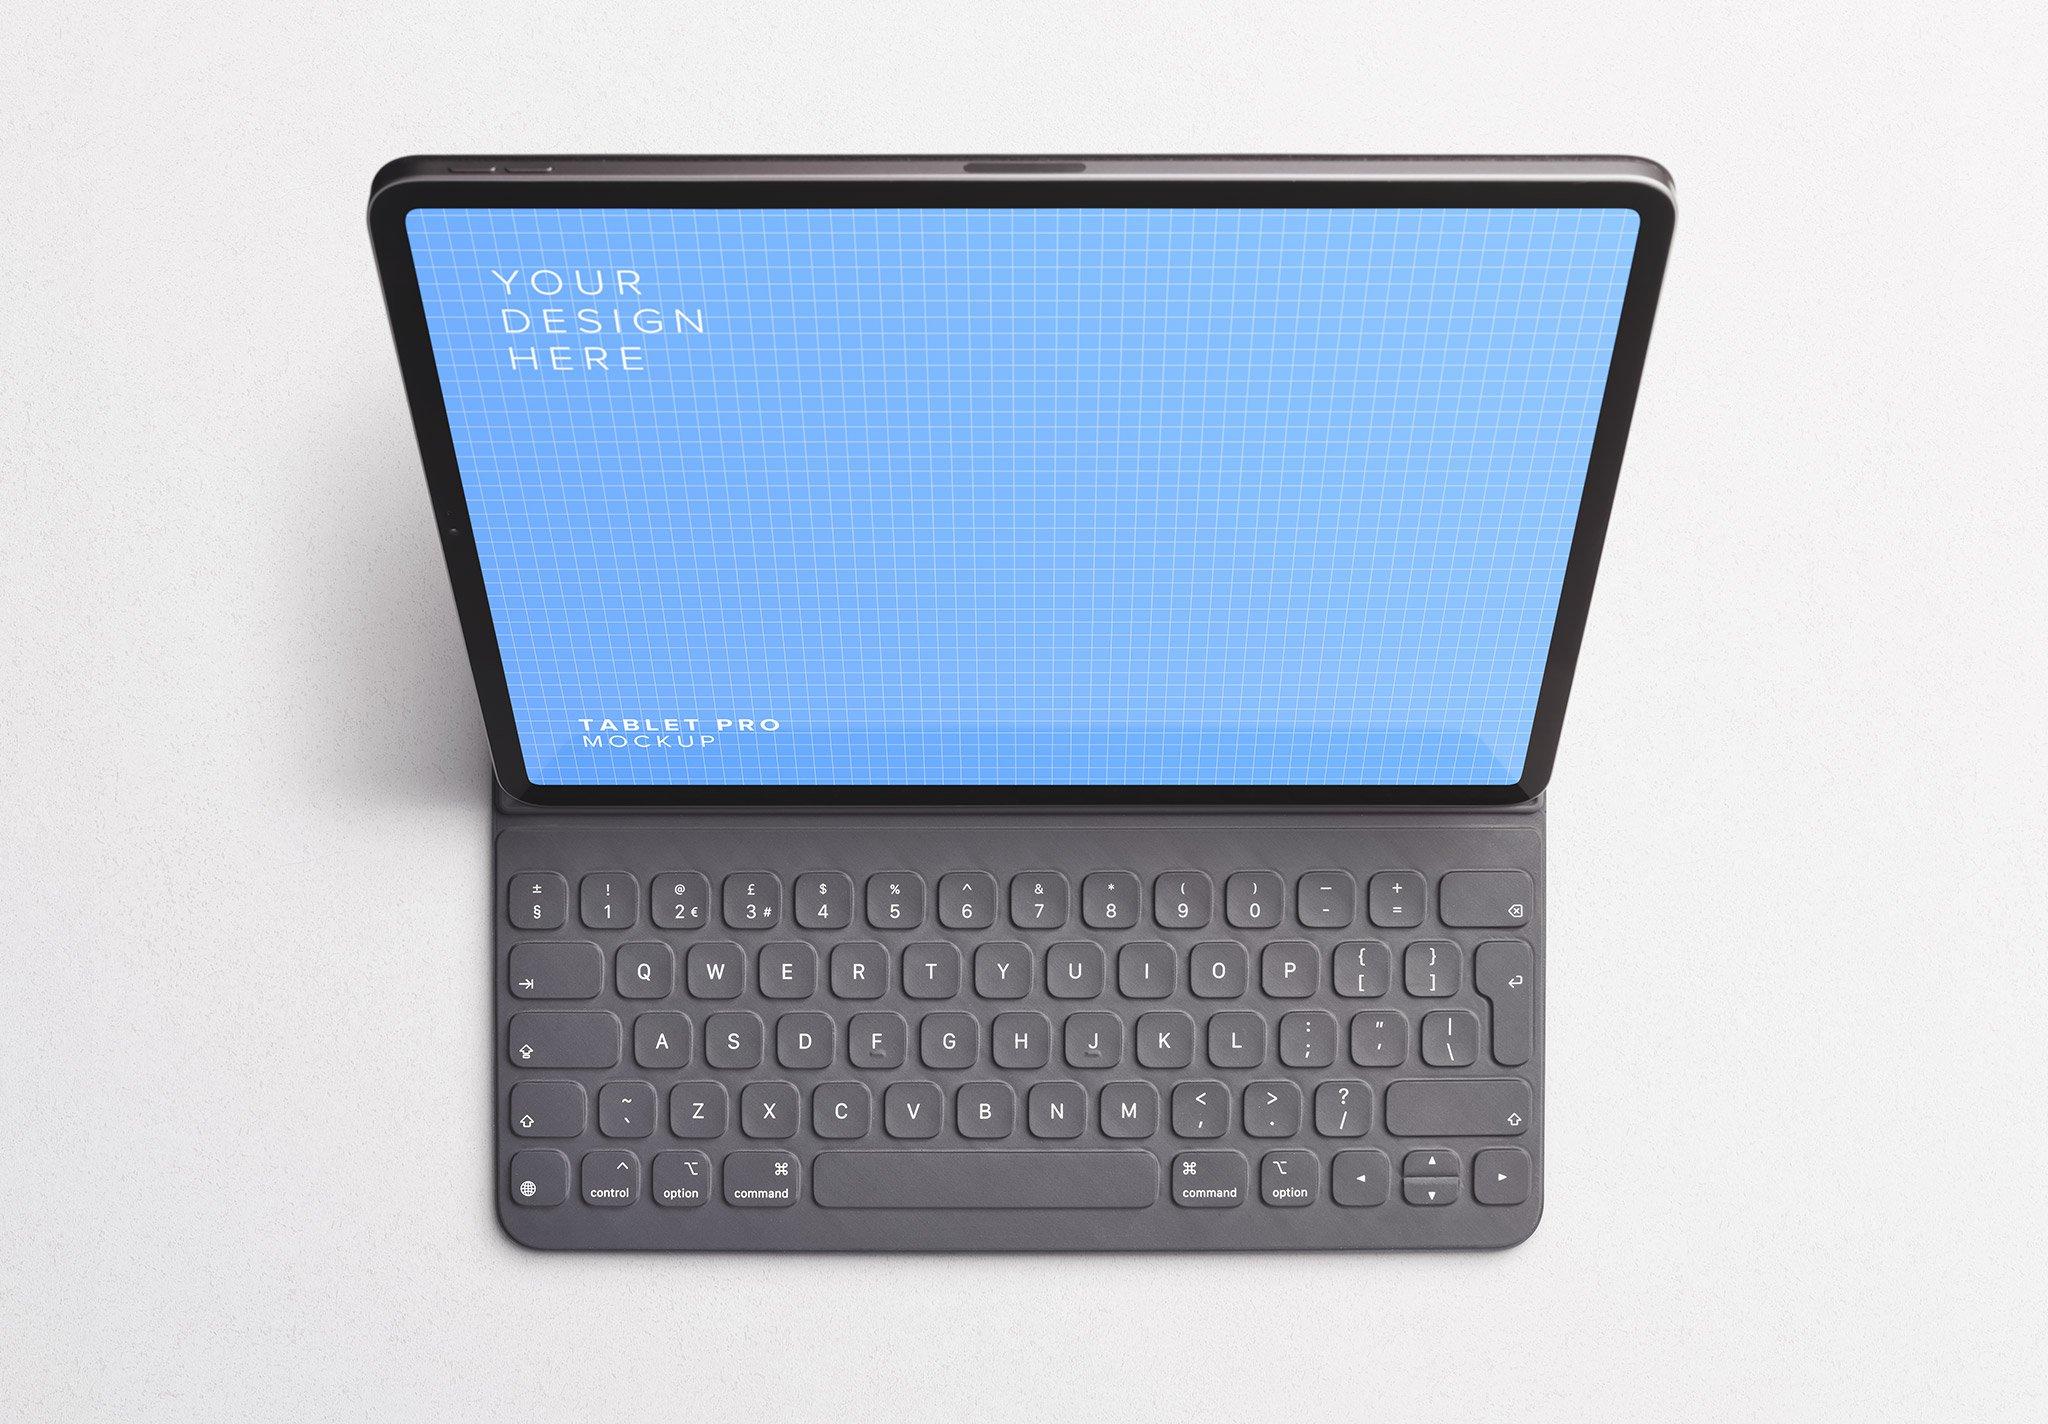 tablet pro mockup w keyboard Thumbnail